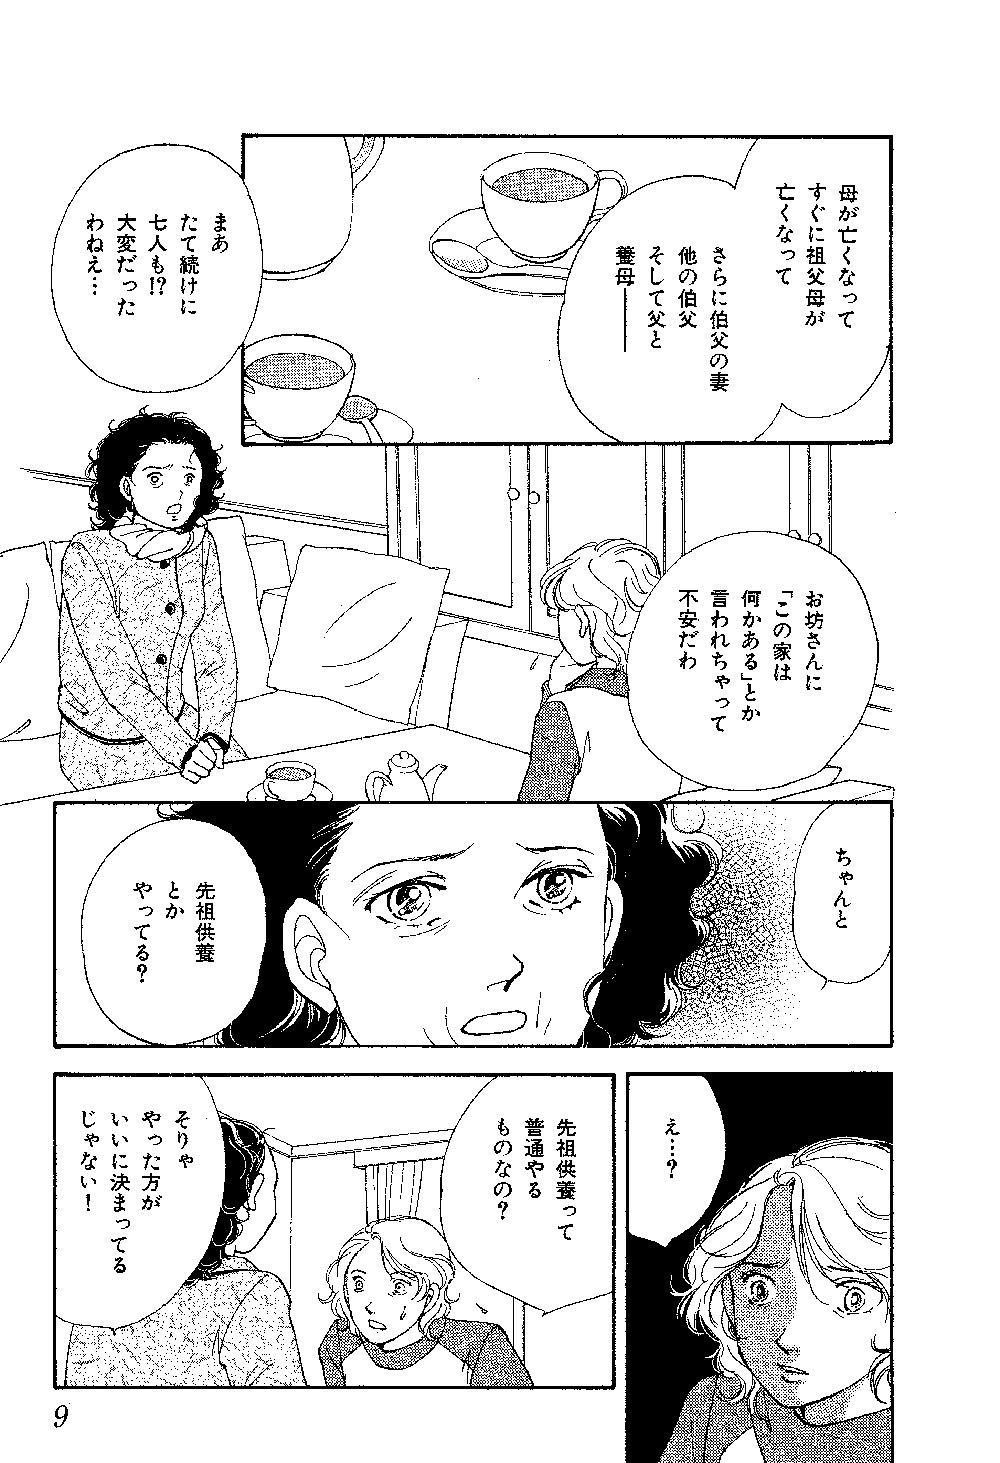 mayuri_0001_0009.jpg